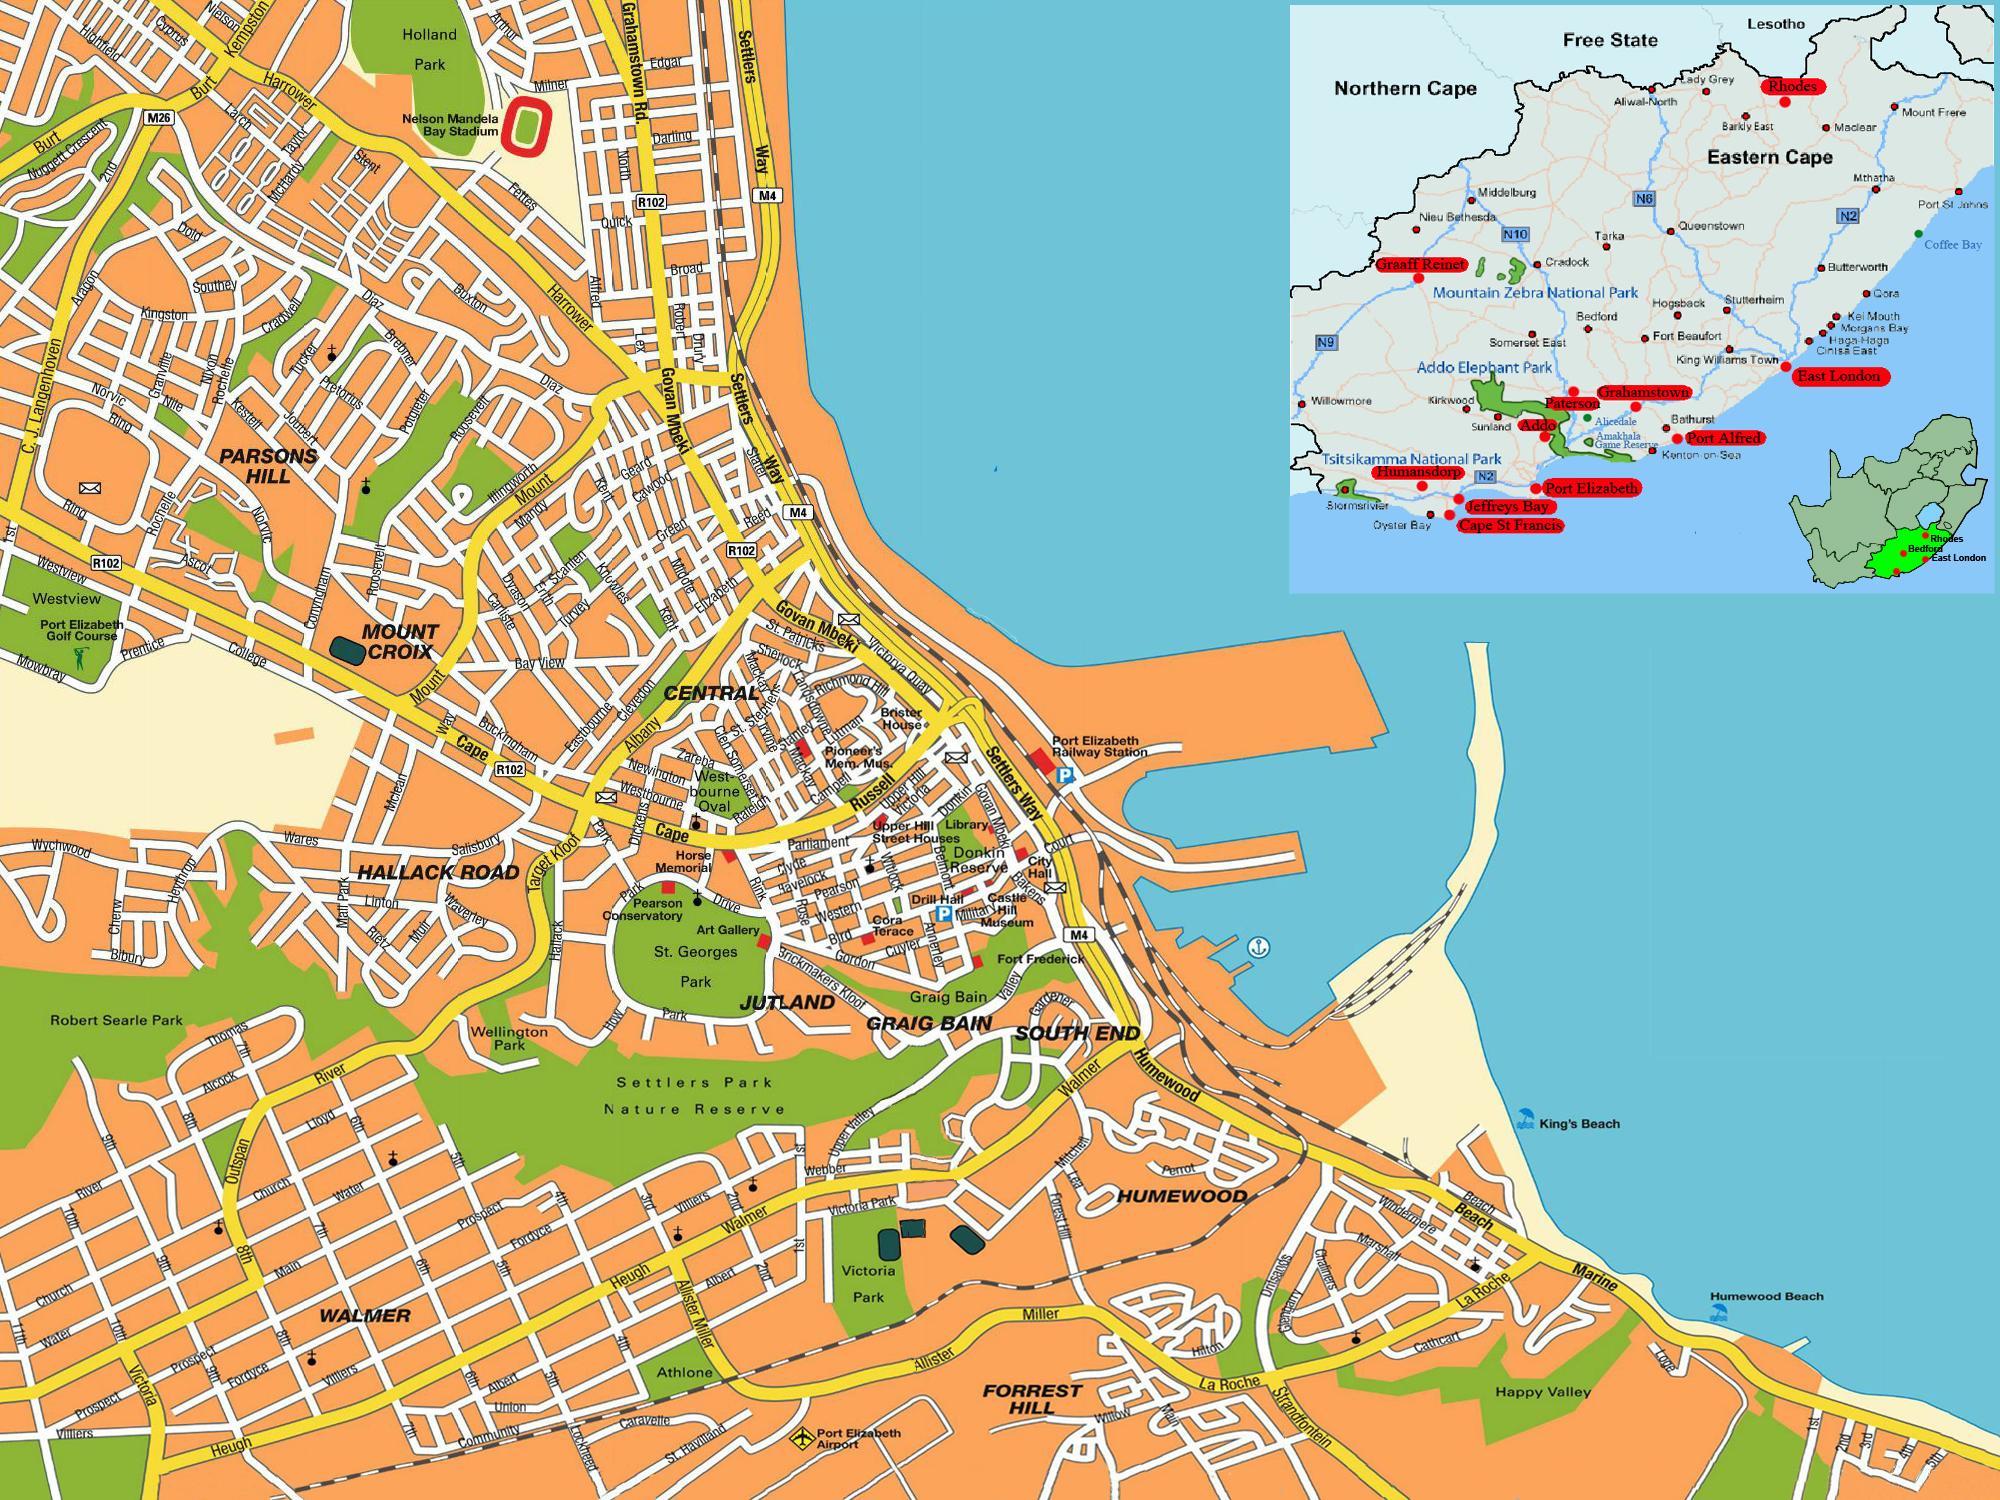 Port Elizabeth street map